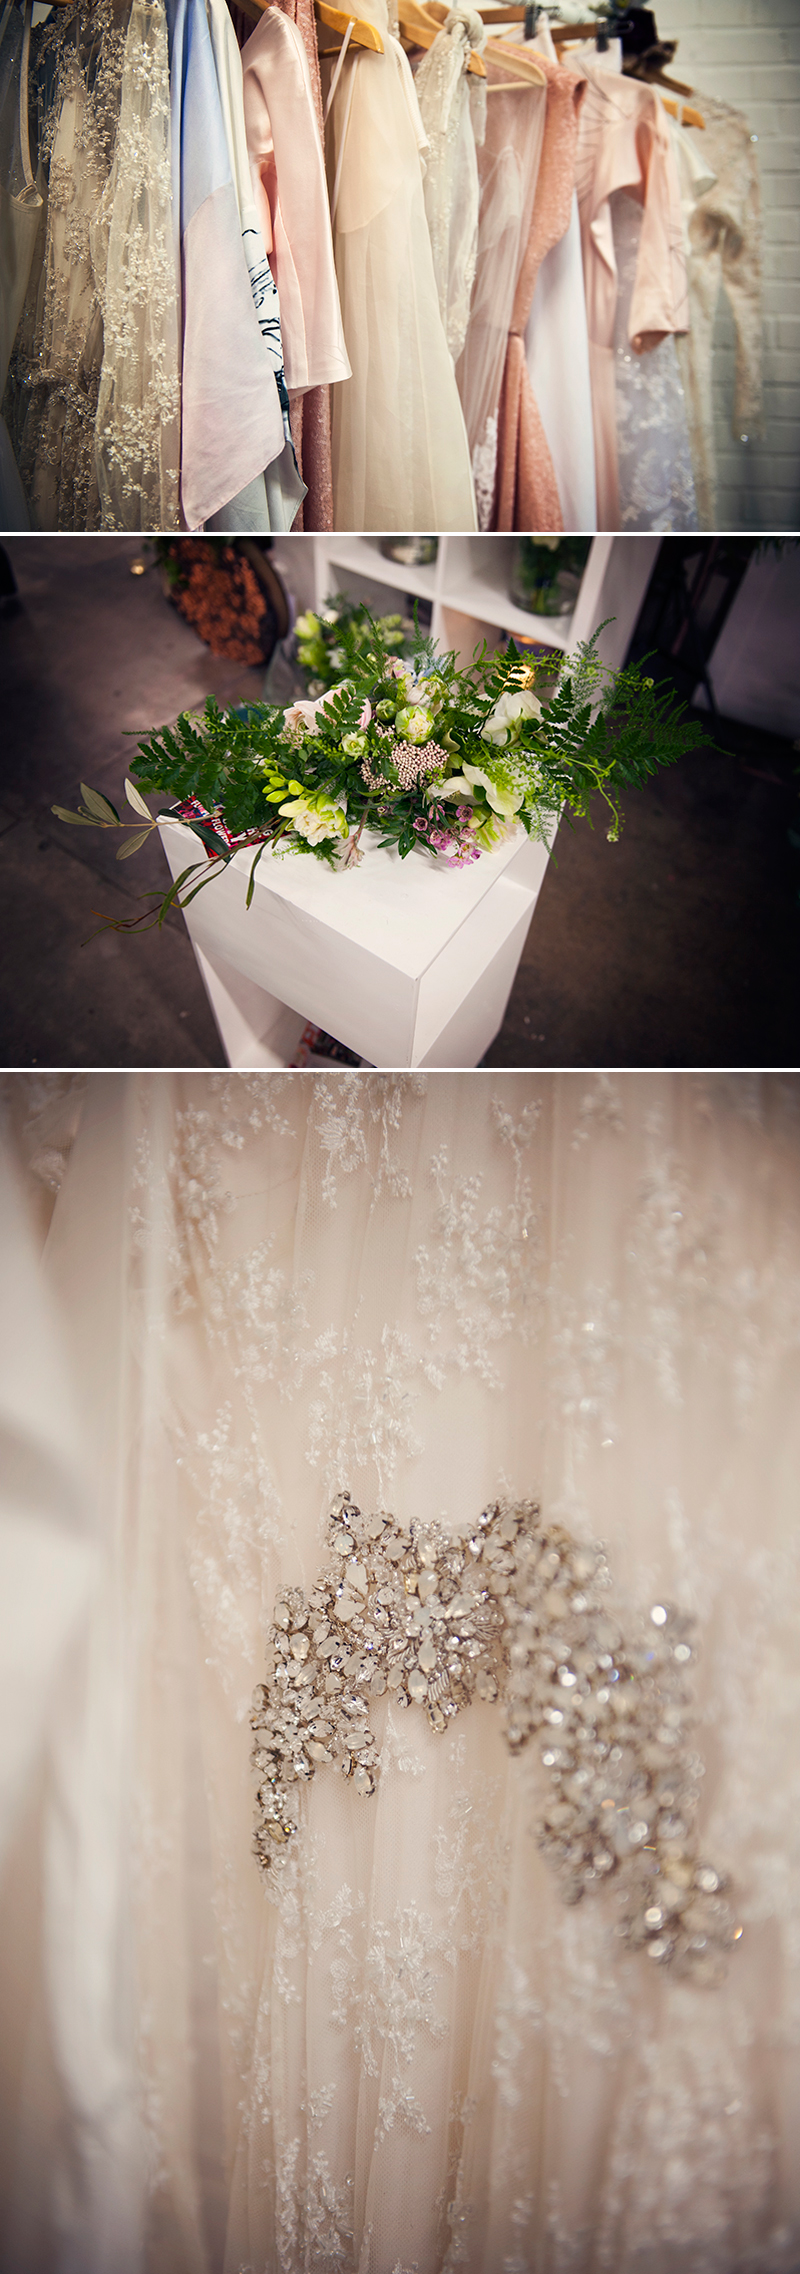 a-guide-to-wedding-fairs-wedding-planning-coco-wedding-venues-001